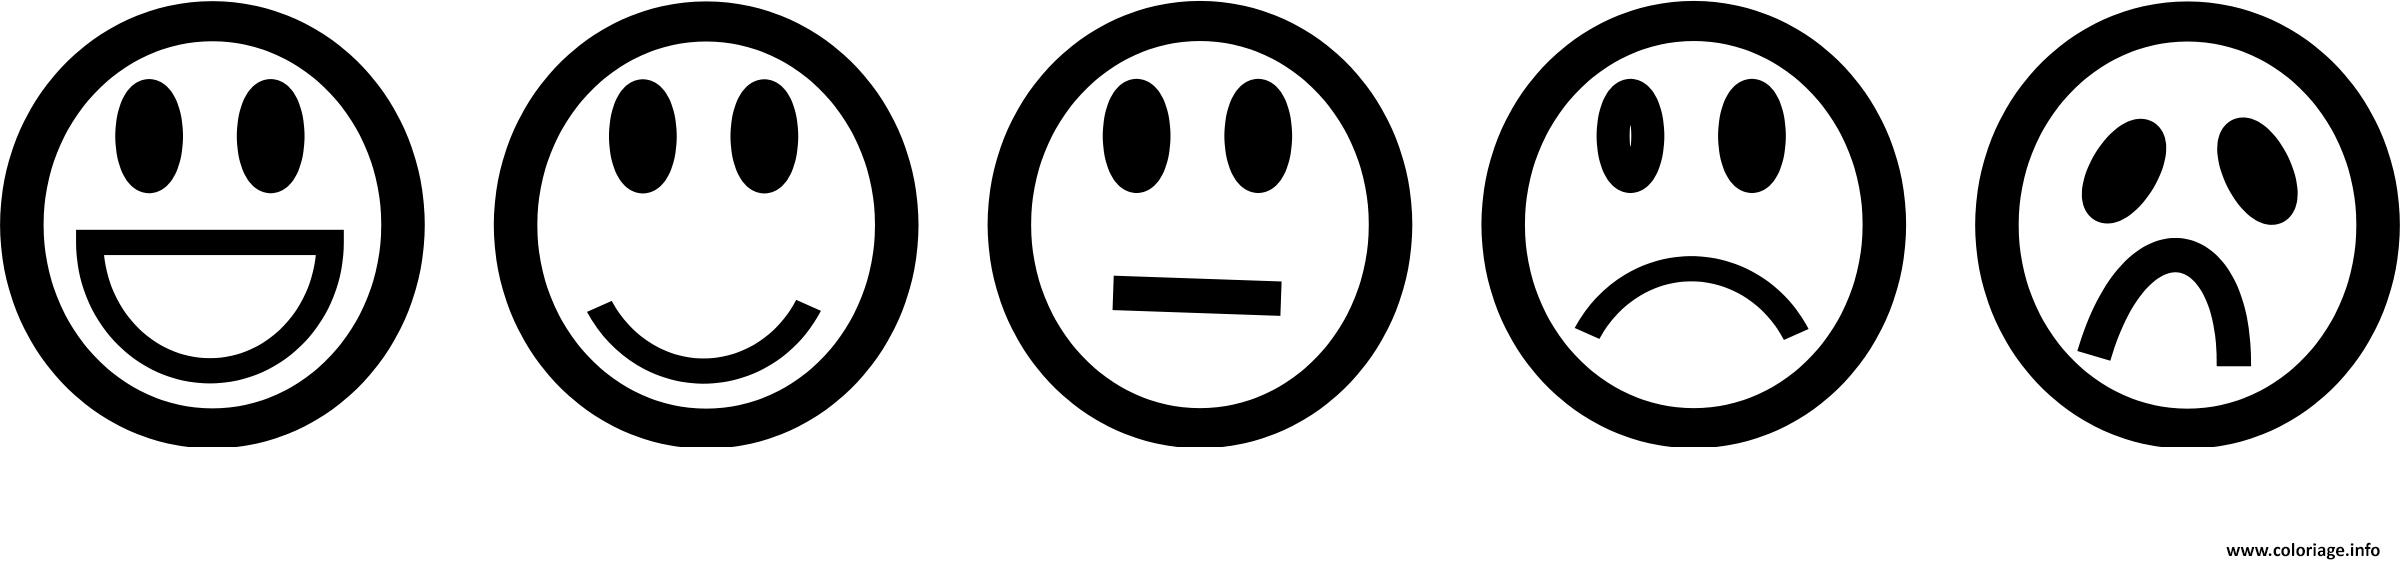 Coloriage De Caca Emoji Coloriages à Imprimer Gratuits